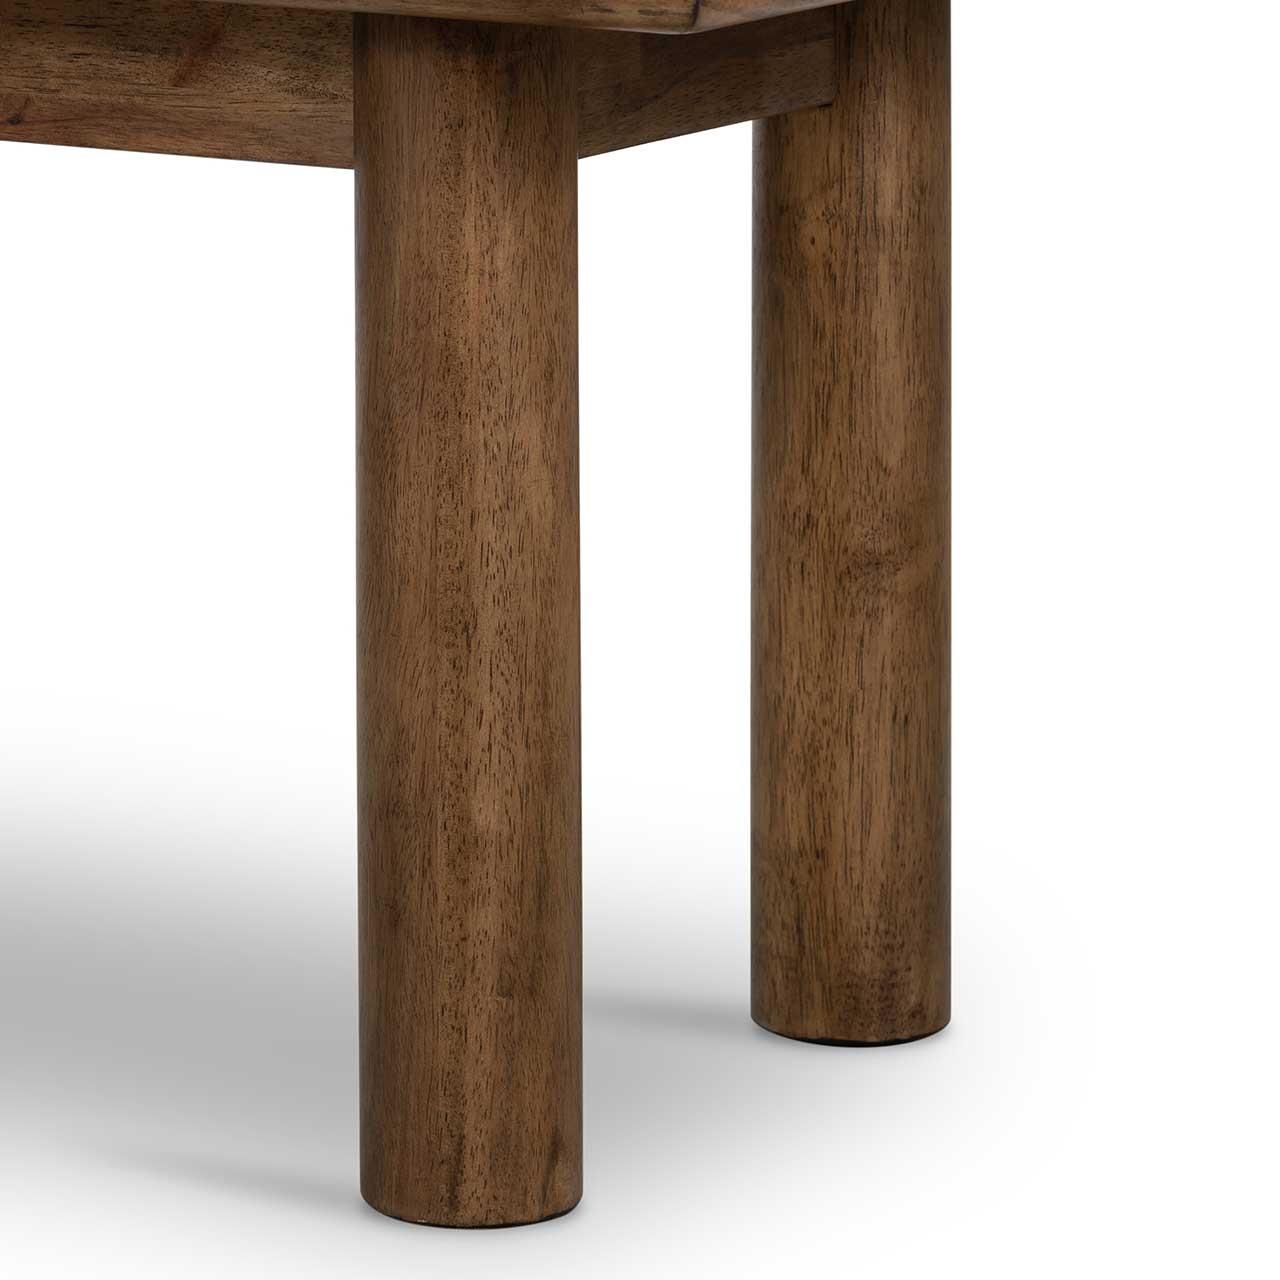 Mandy Upholstered  Bench - Natural